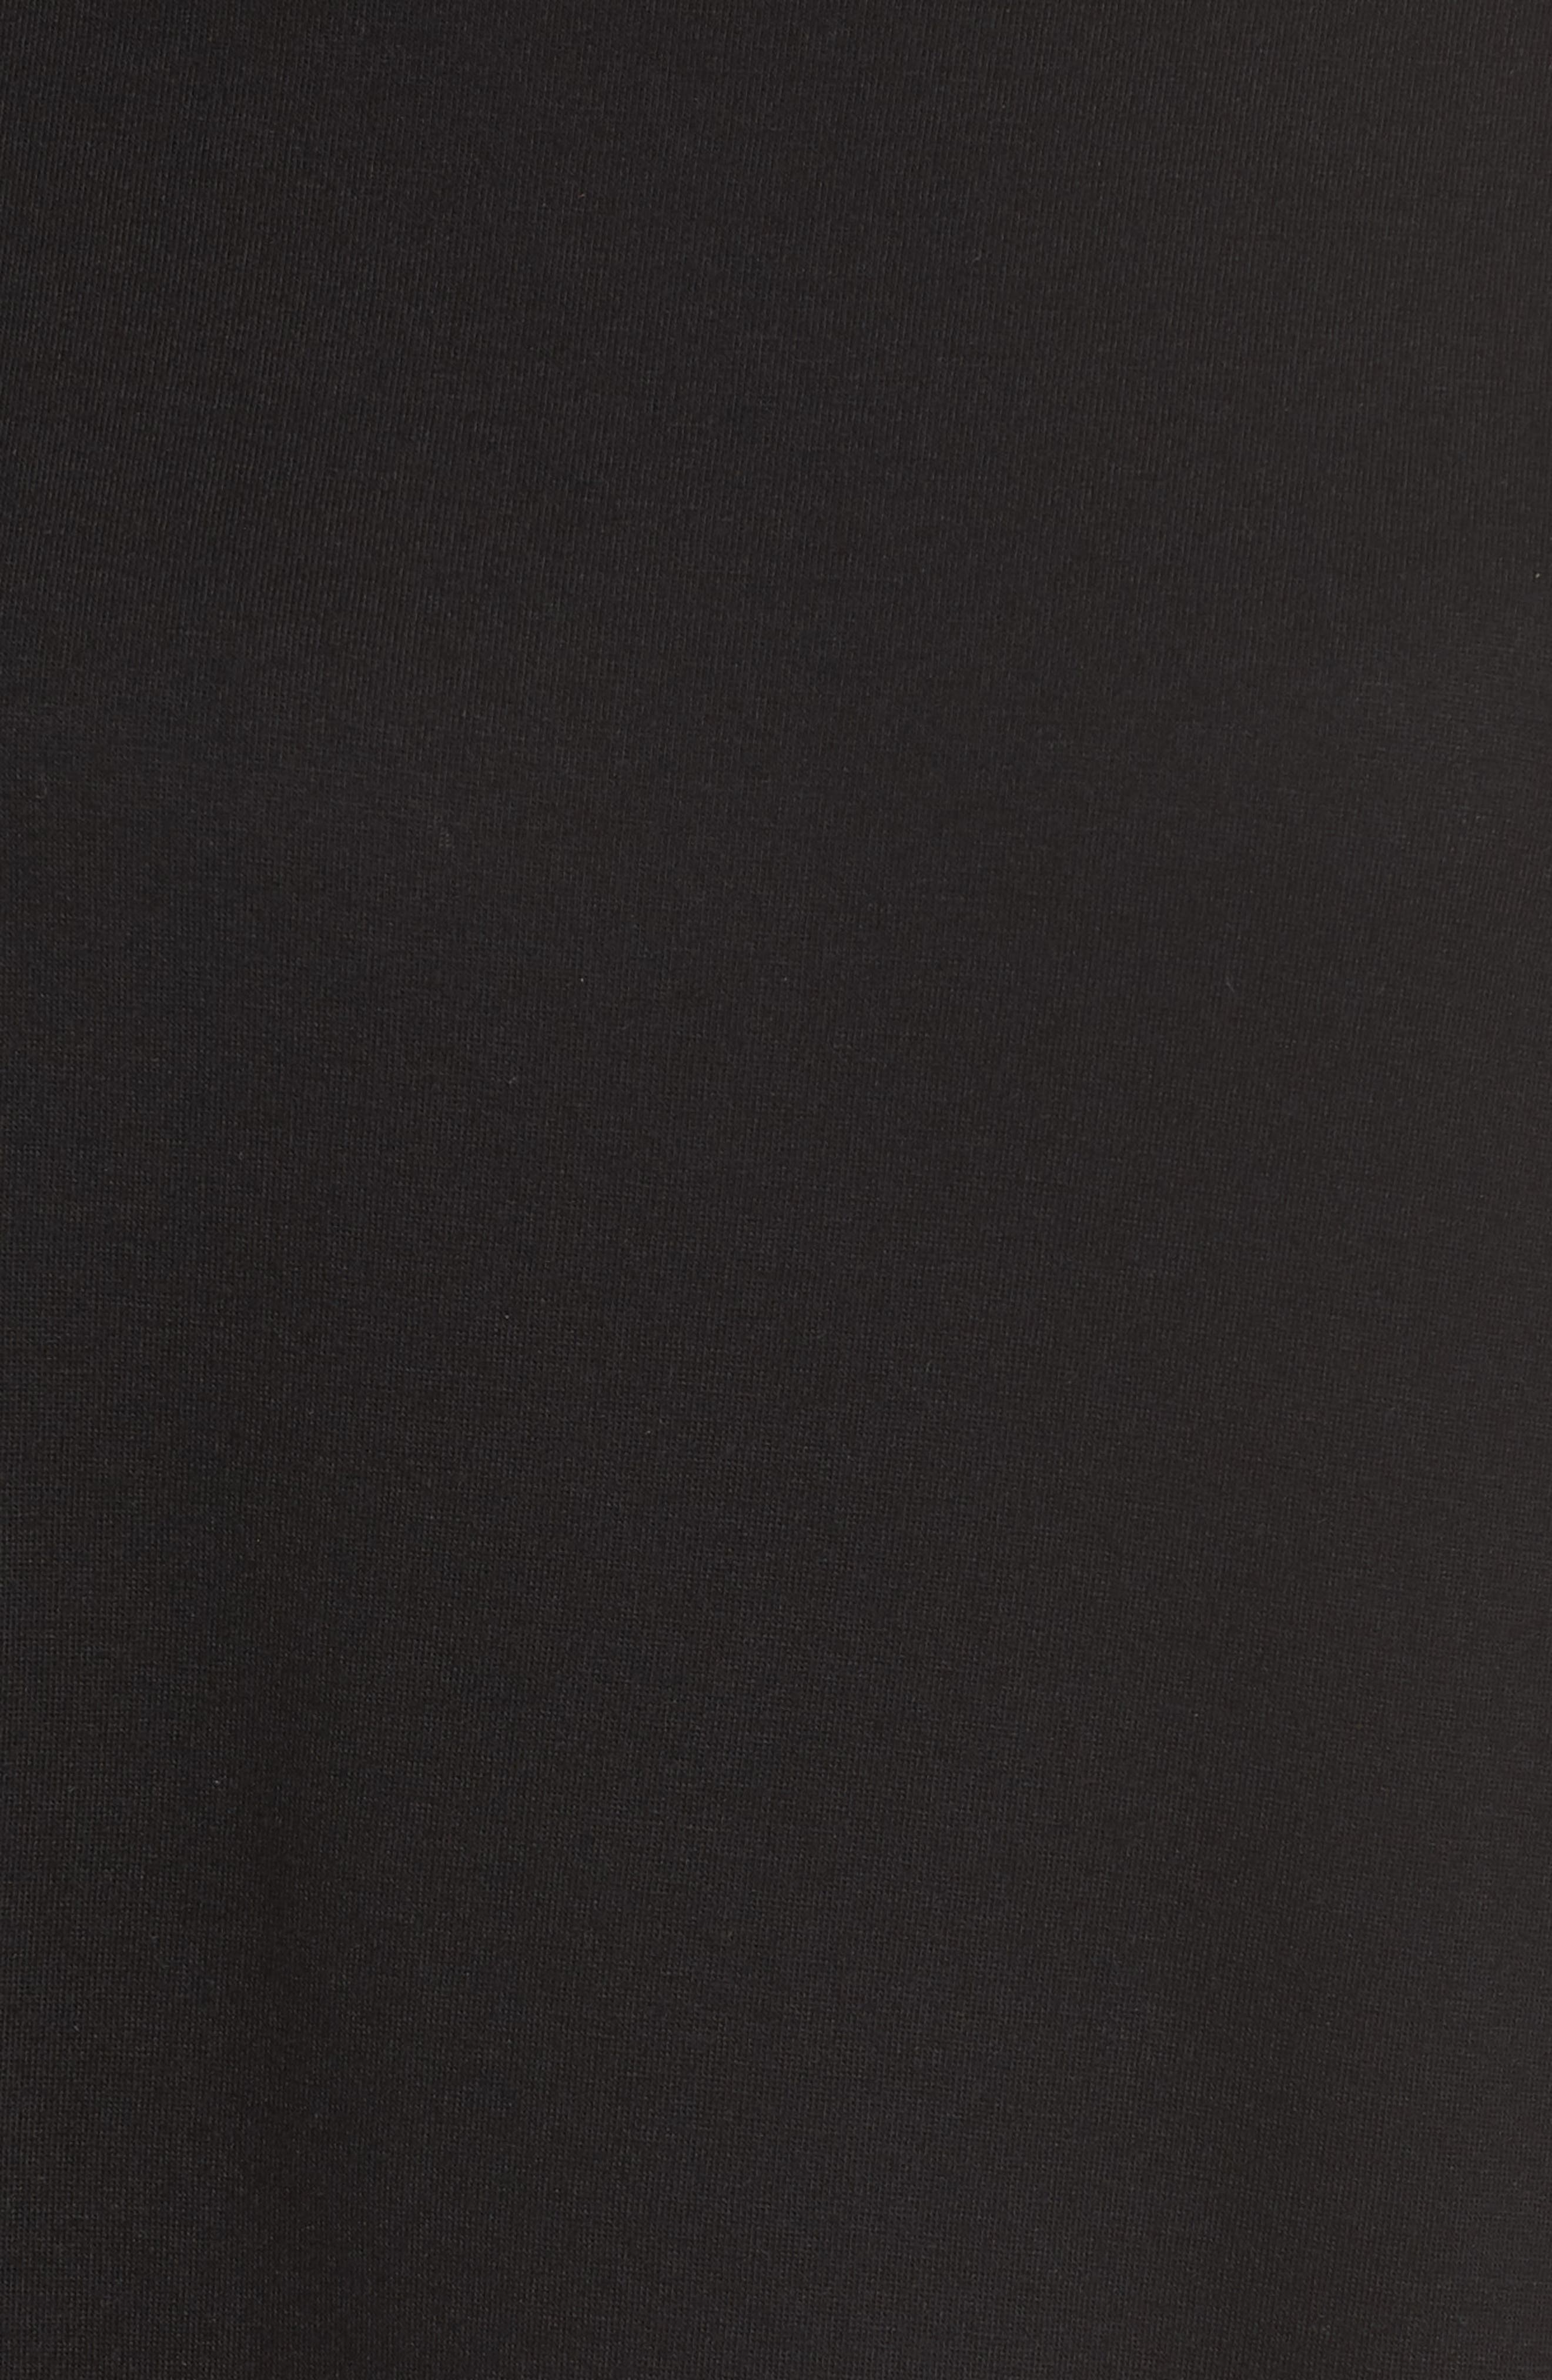 Luxe Shangri-La Pajamas,                             Alternate thumbnail 5, color,                             BLACK/ COCOON